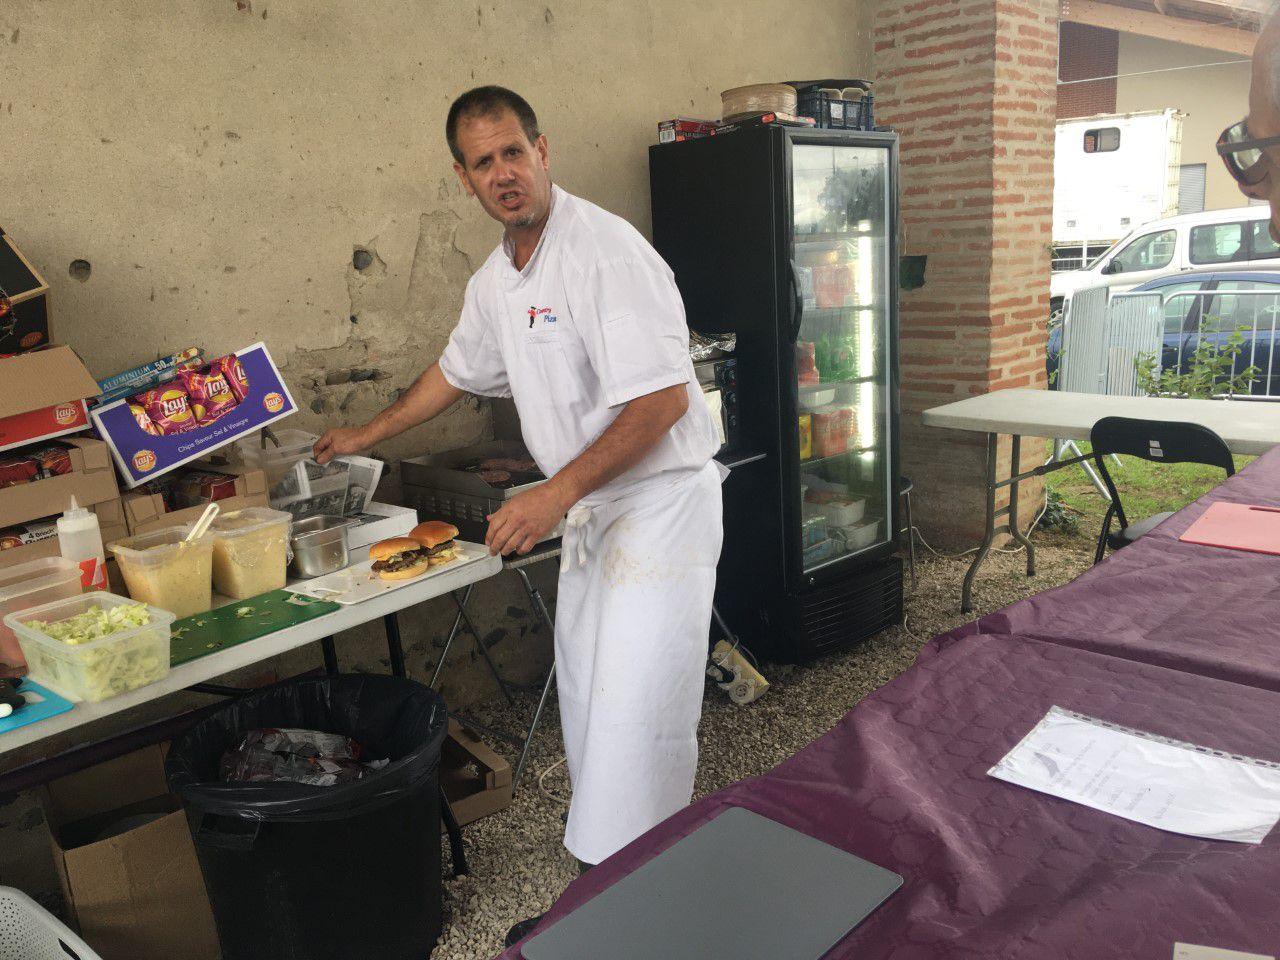 Jimmy - Country Pizza - Castelnau d'Estrétefonds - Tel. 05 61 35 18 49